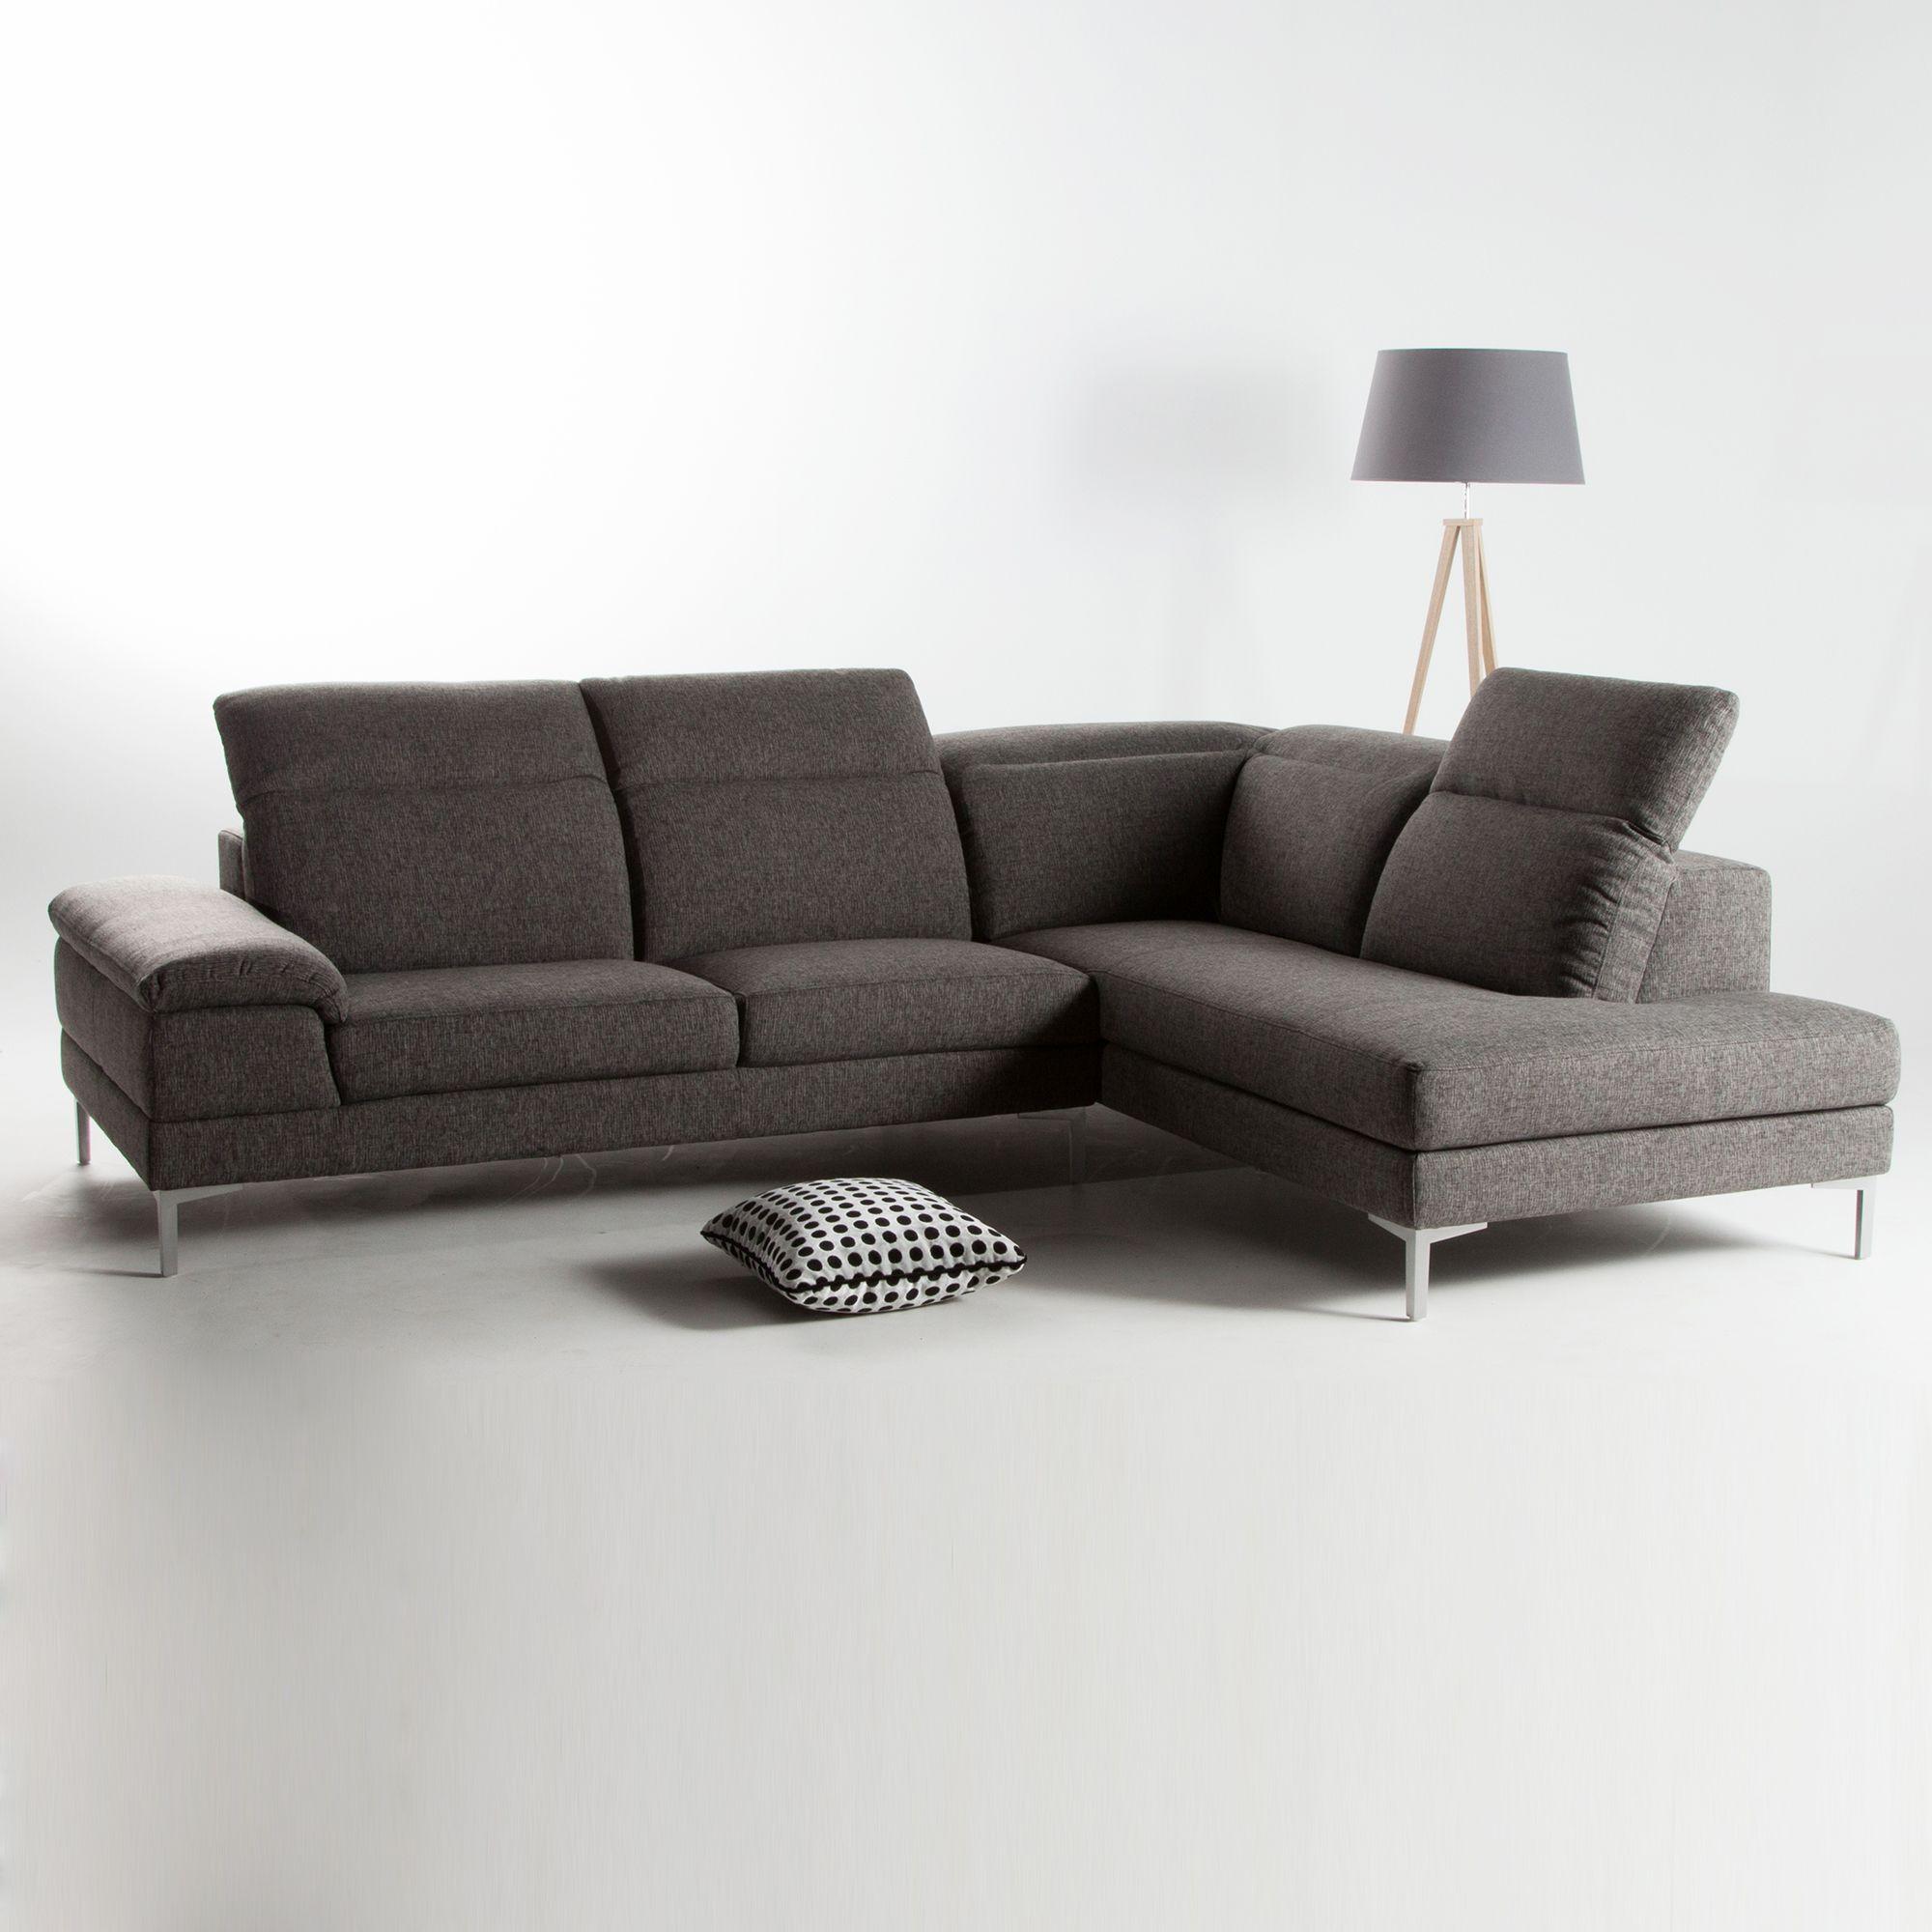 canap d 39 angle tissu 4 places avec t ti res r glables pieds m tal agatha d co pinterest. Black Bedroom Furniture Sets. Home Design Ideas